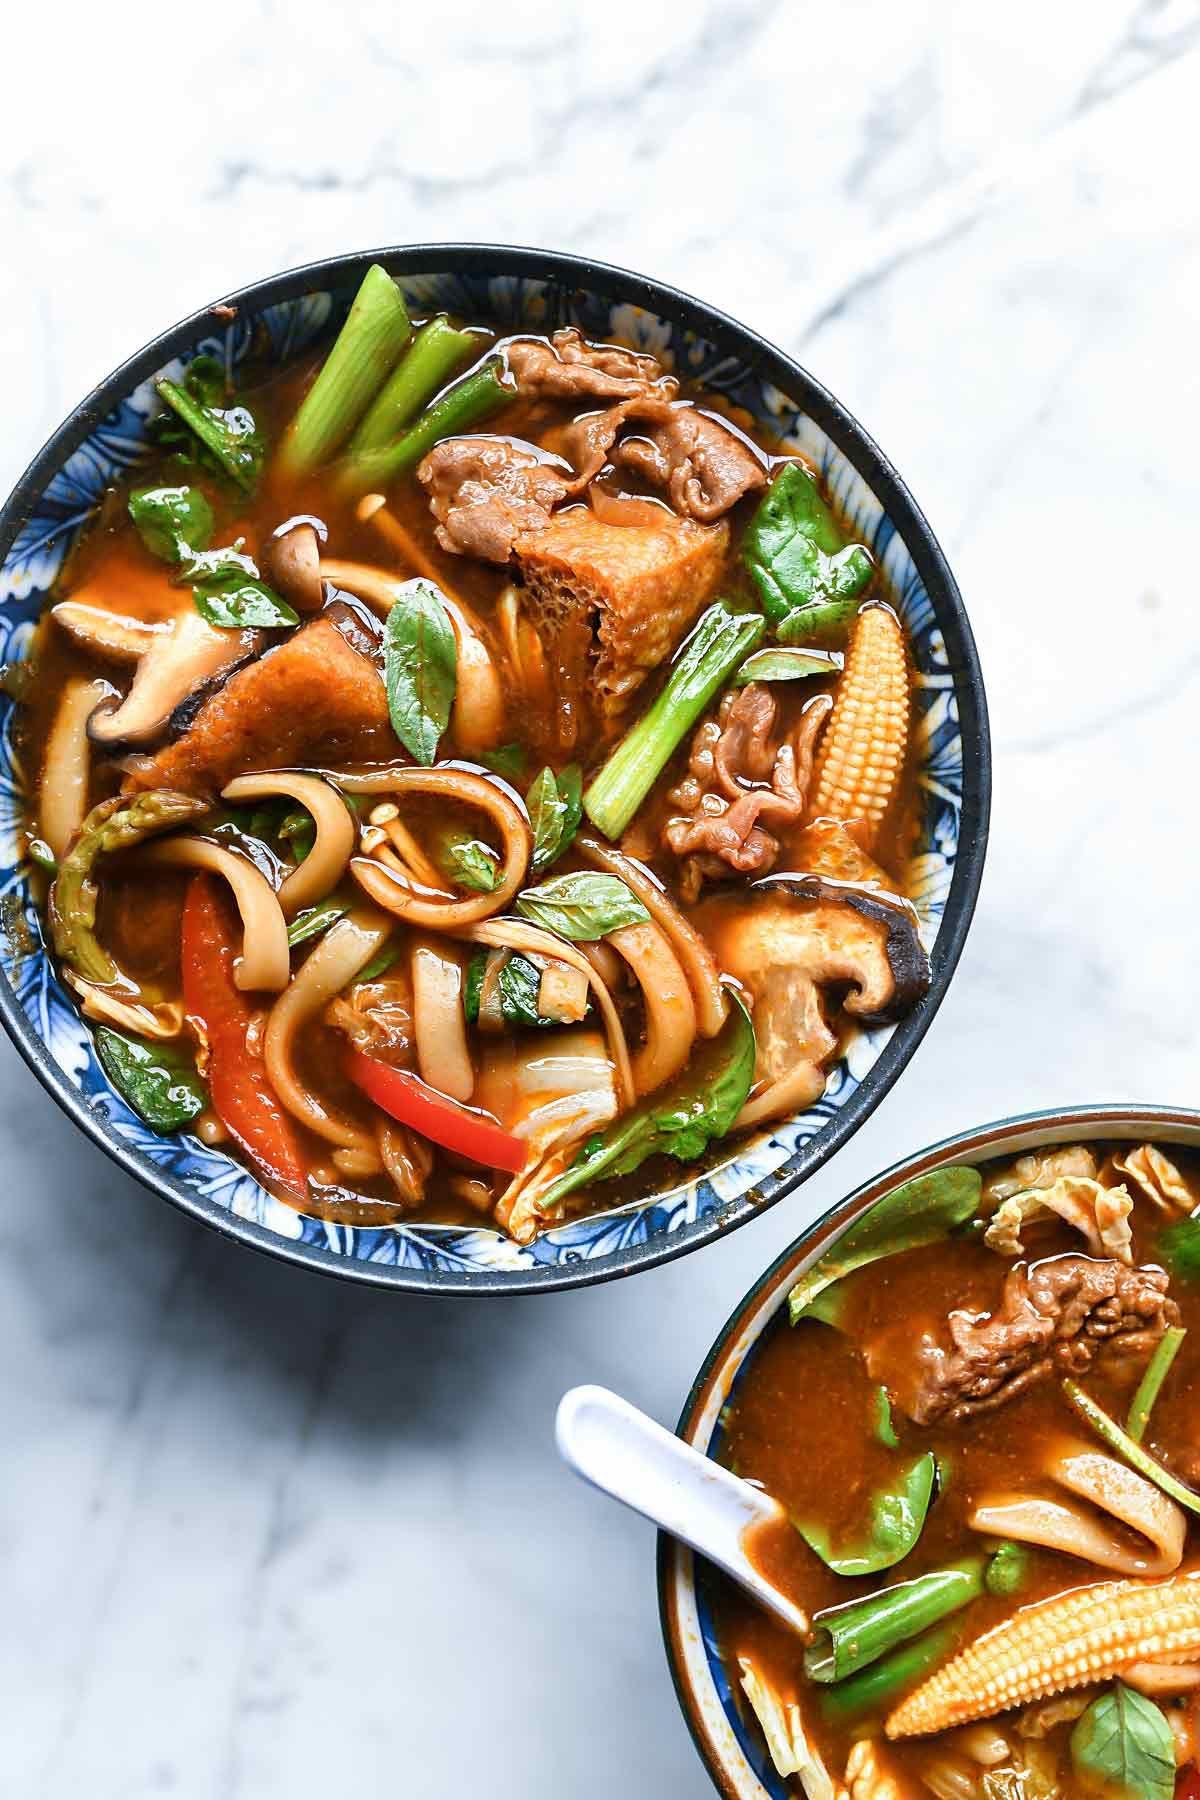 Easy Asian Hot Pot Recipe Foodiecrush Com Hotpot Soup Asian Dinner Instantpot Ramen Noodles Hot Pot Recipe